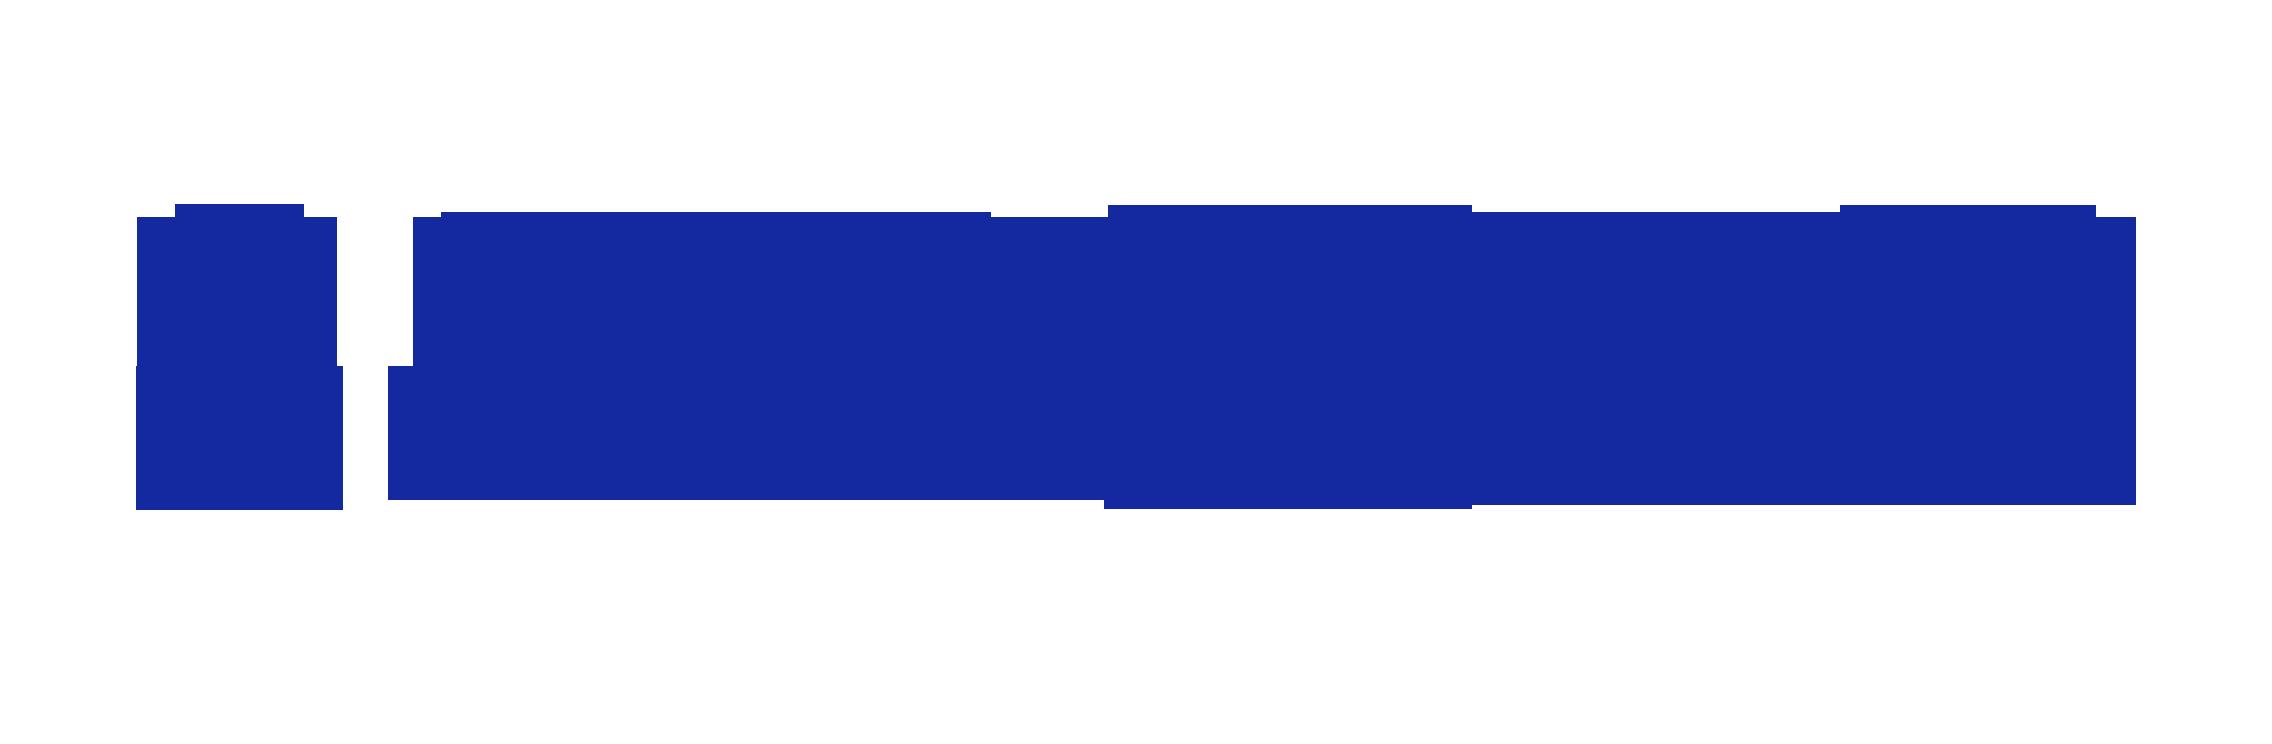 Samsung fit-e